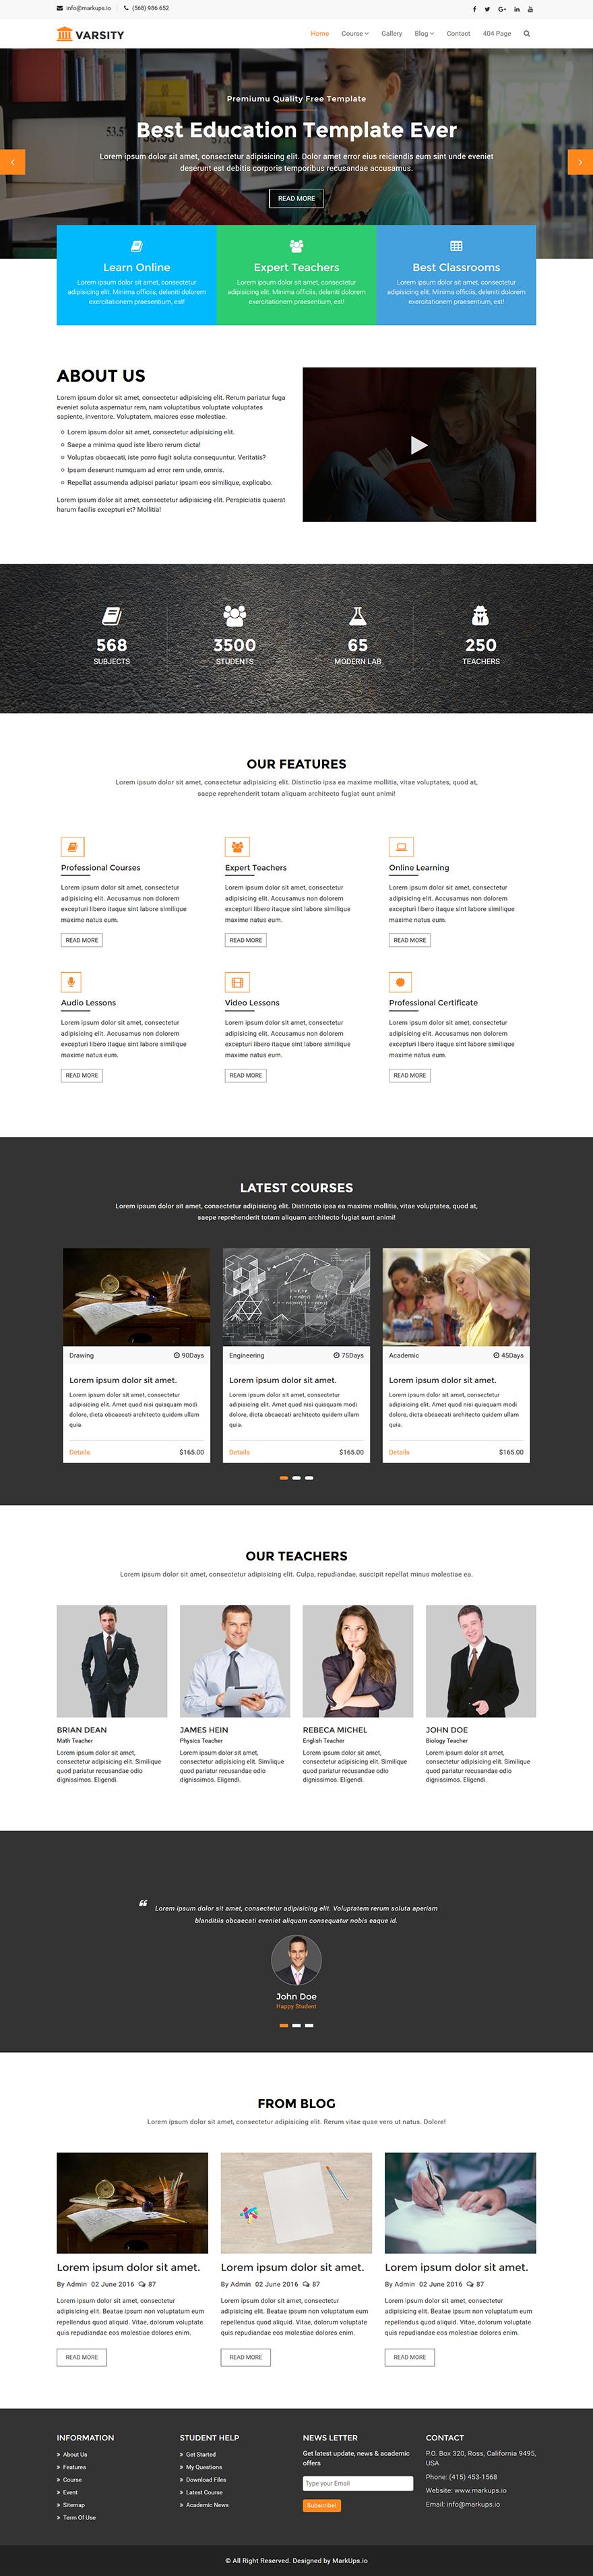 Free Education Website HTML Template - Varsity | Free education ...